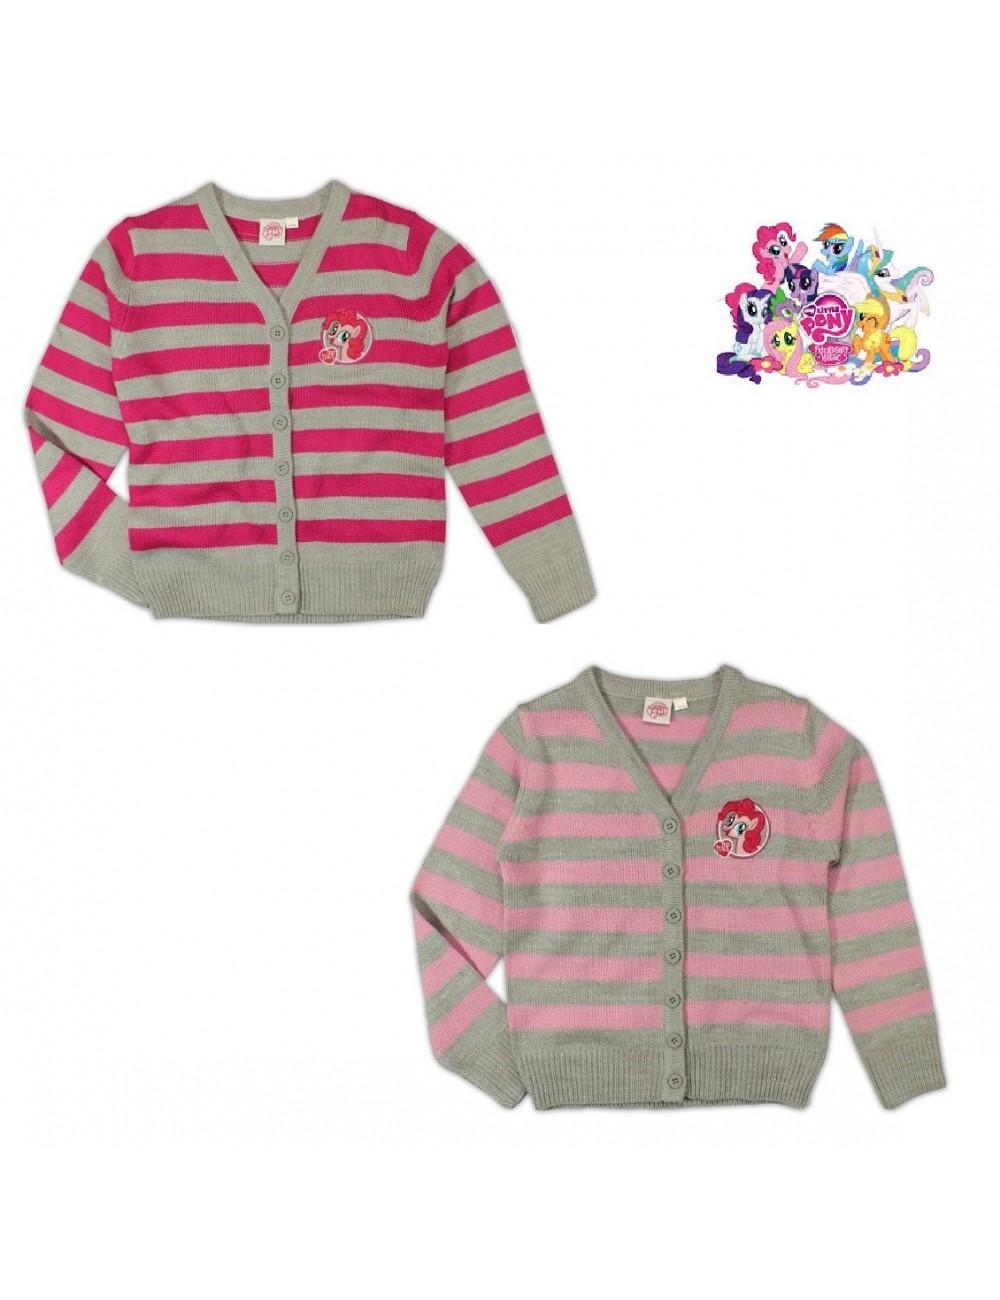 Pulover tricotat cu nasturi My Little Pony 98-128